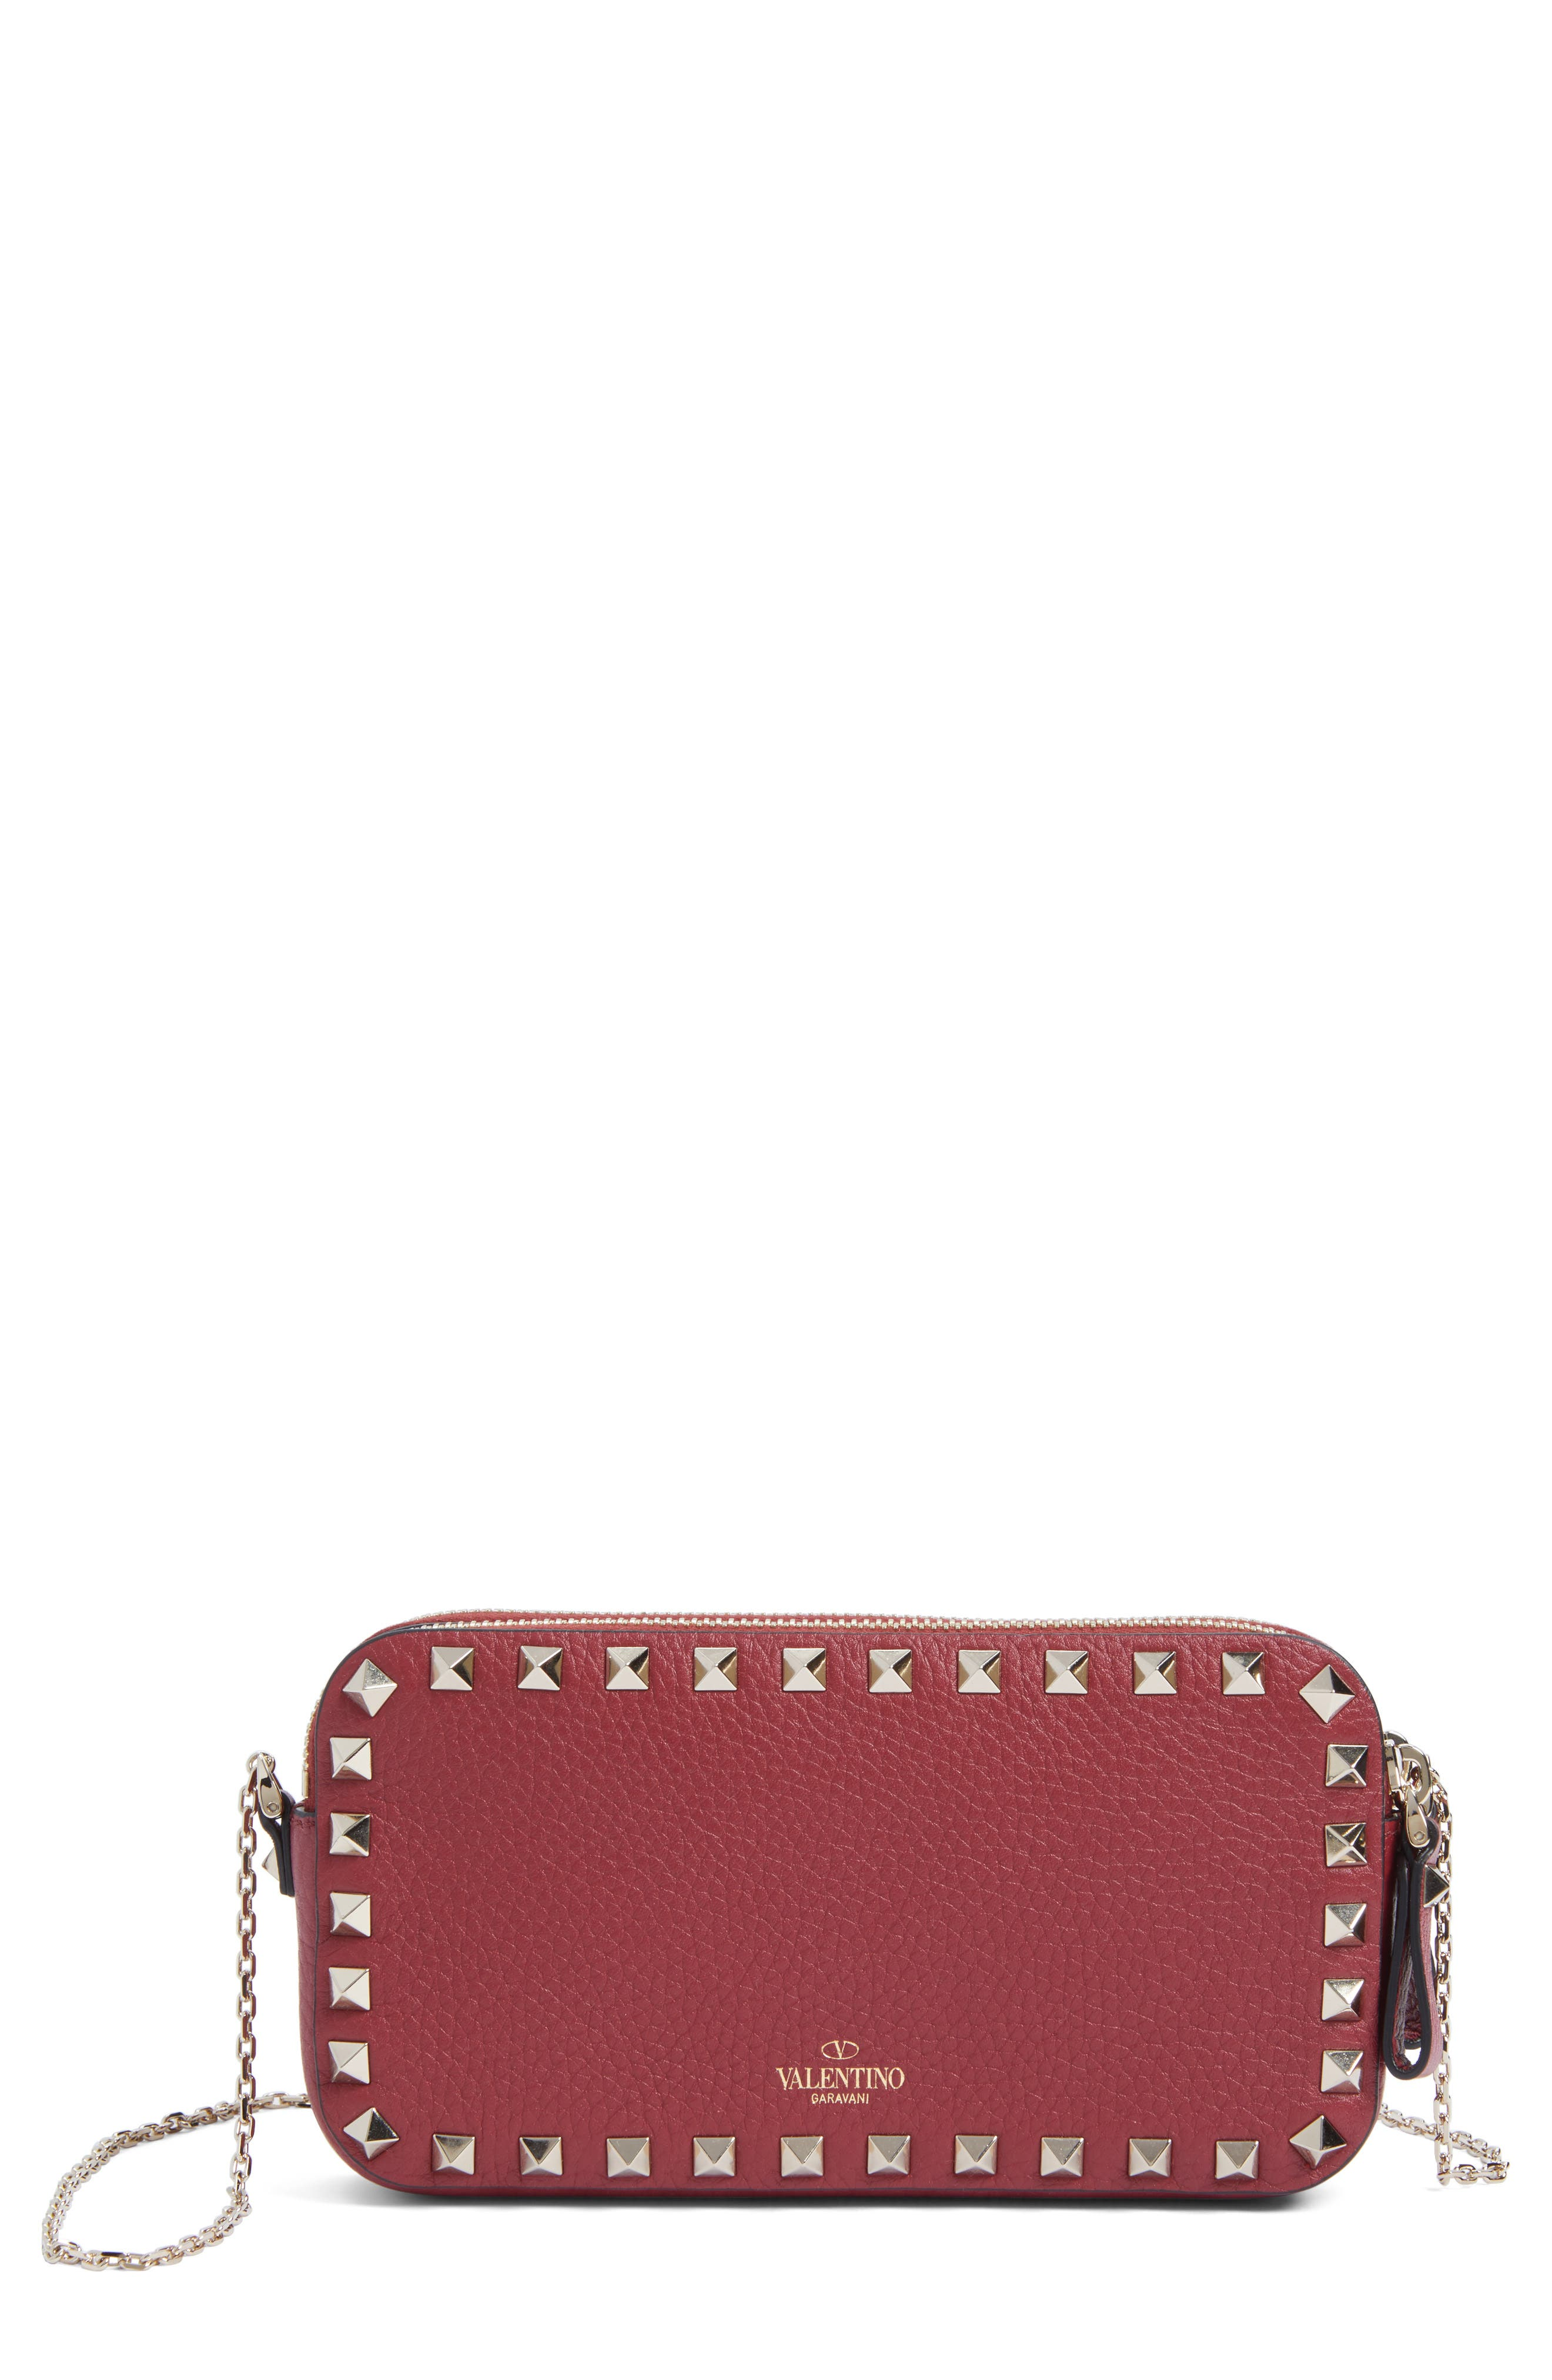 VALENTINO GARAVANI Rockstud Leather Crossbody Bag, Main, color, RUBIN